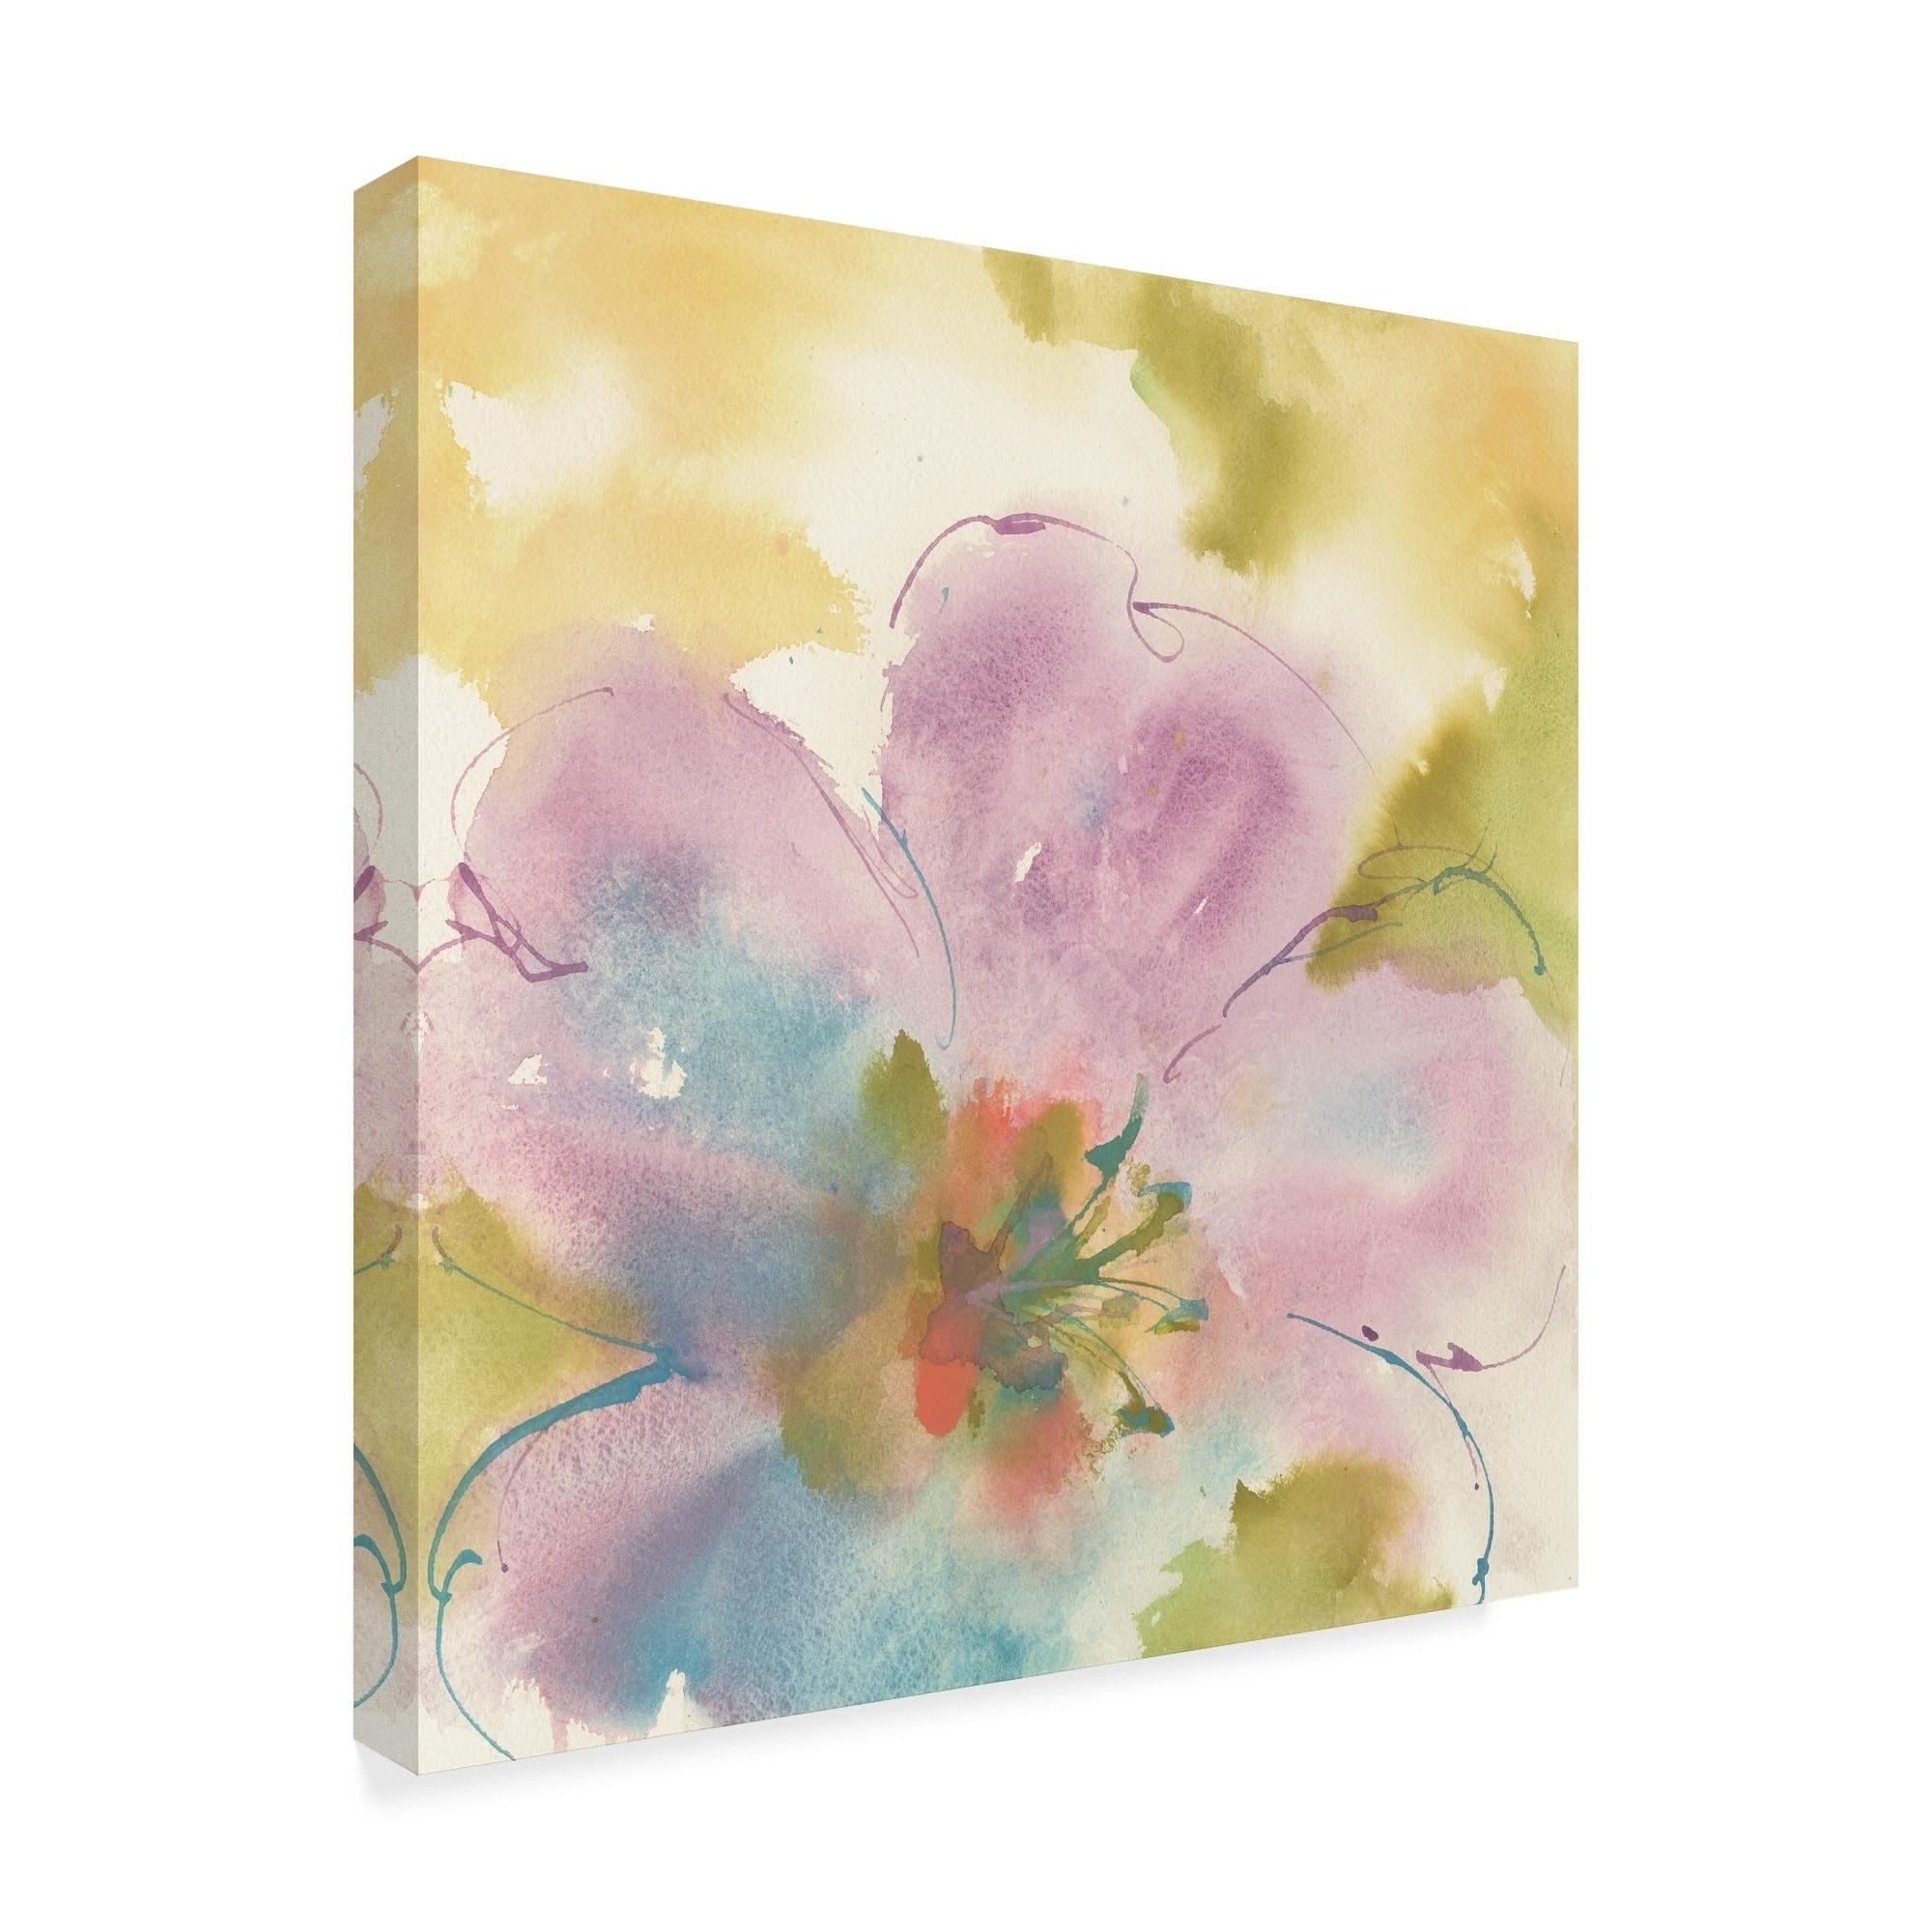 Flower Tints I Canvas Artwork 30 x 30 Global Gallery Chris Paschke